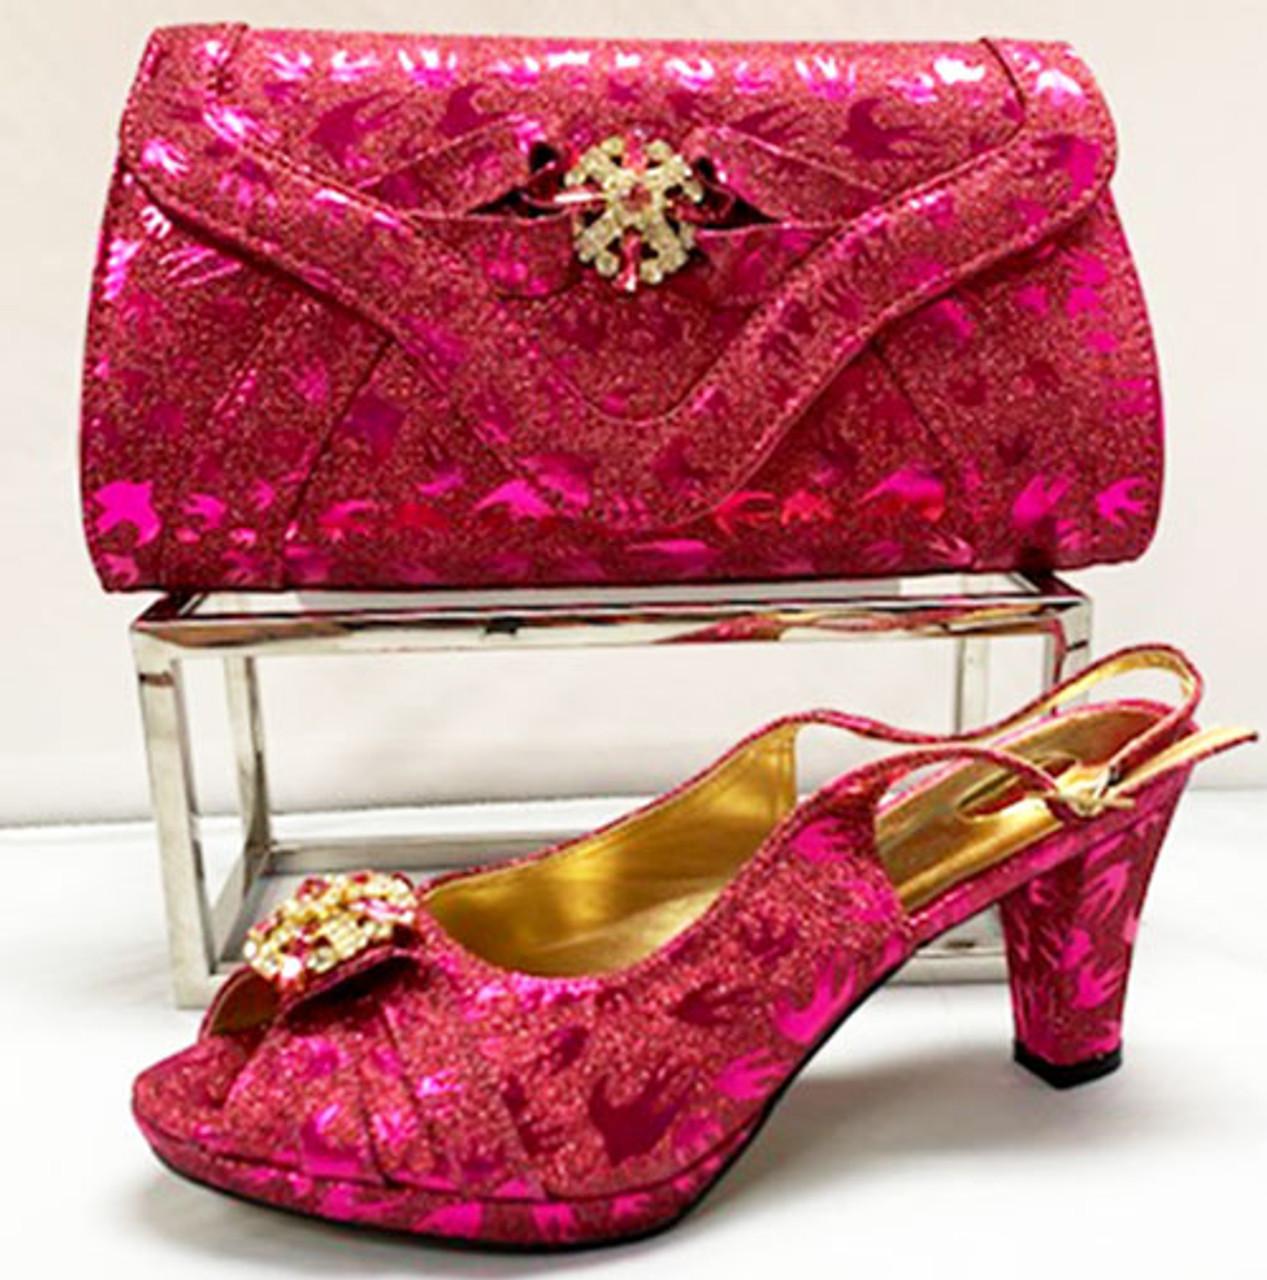 Grand Diamond Shoes \u0026 Bag # 16 (Fuchsia